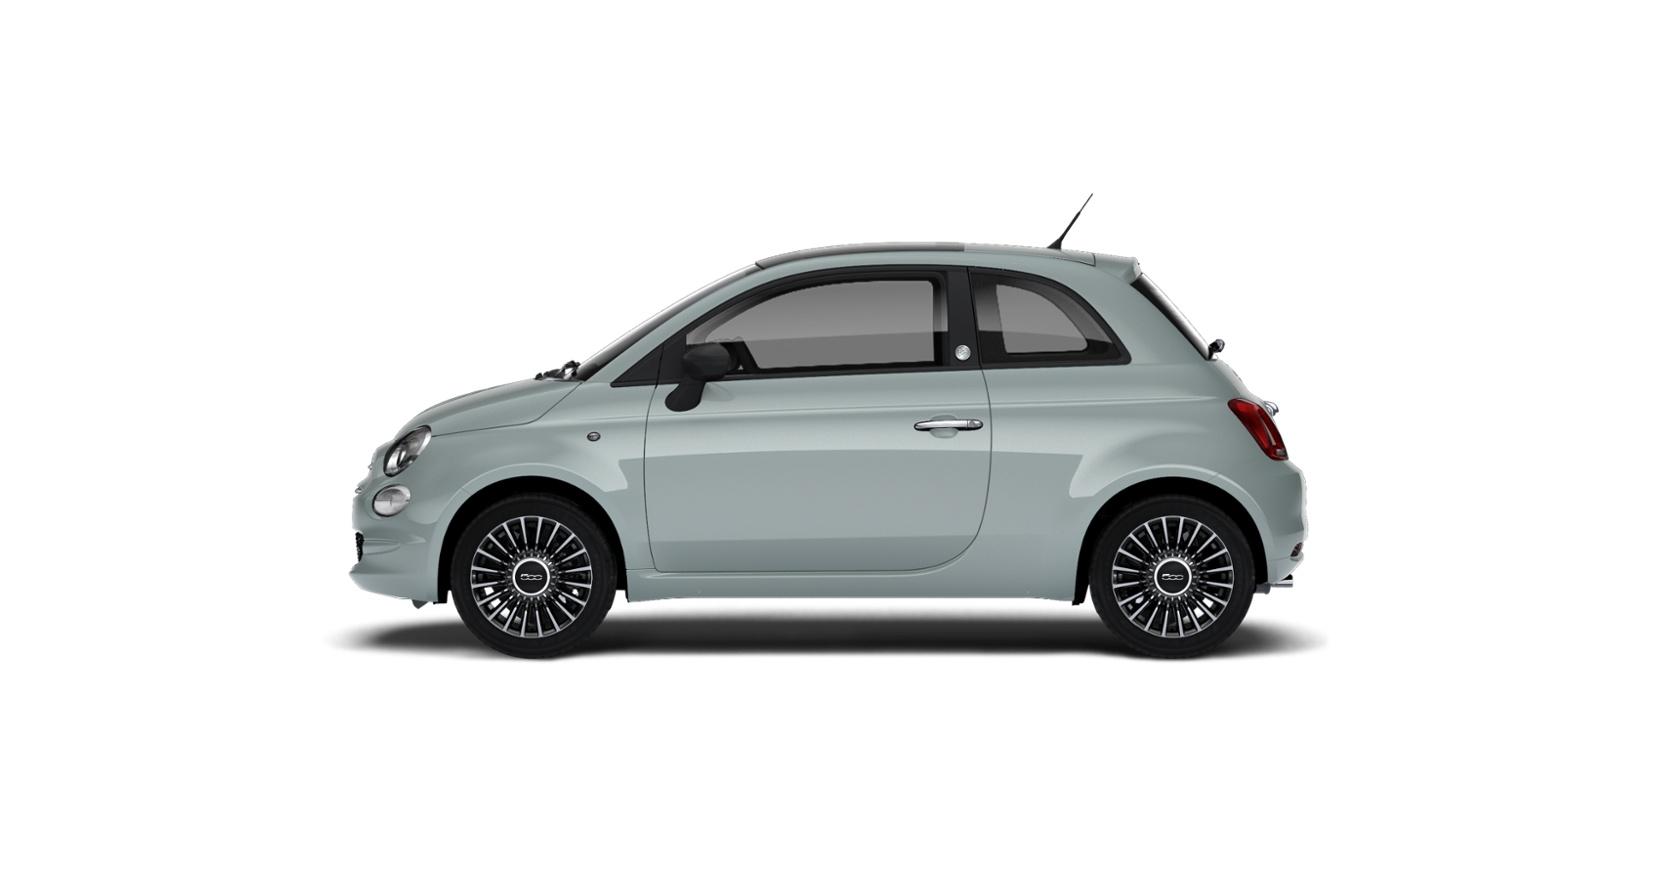 Fiat 500 hybrid launch edition - zijkant